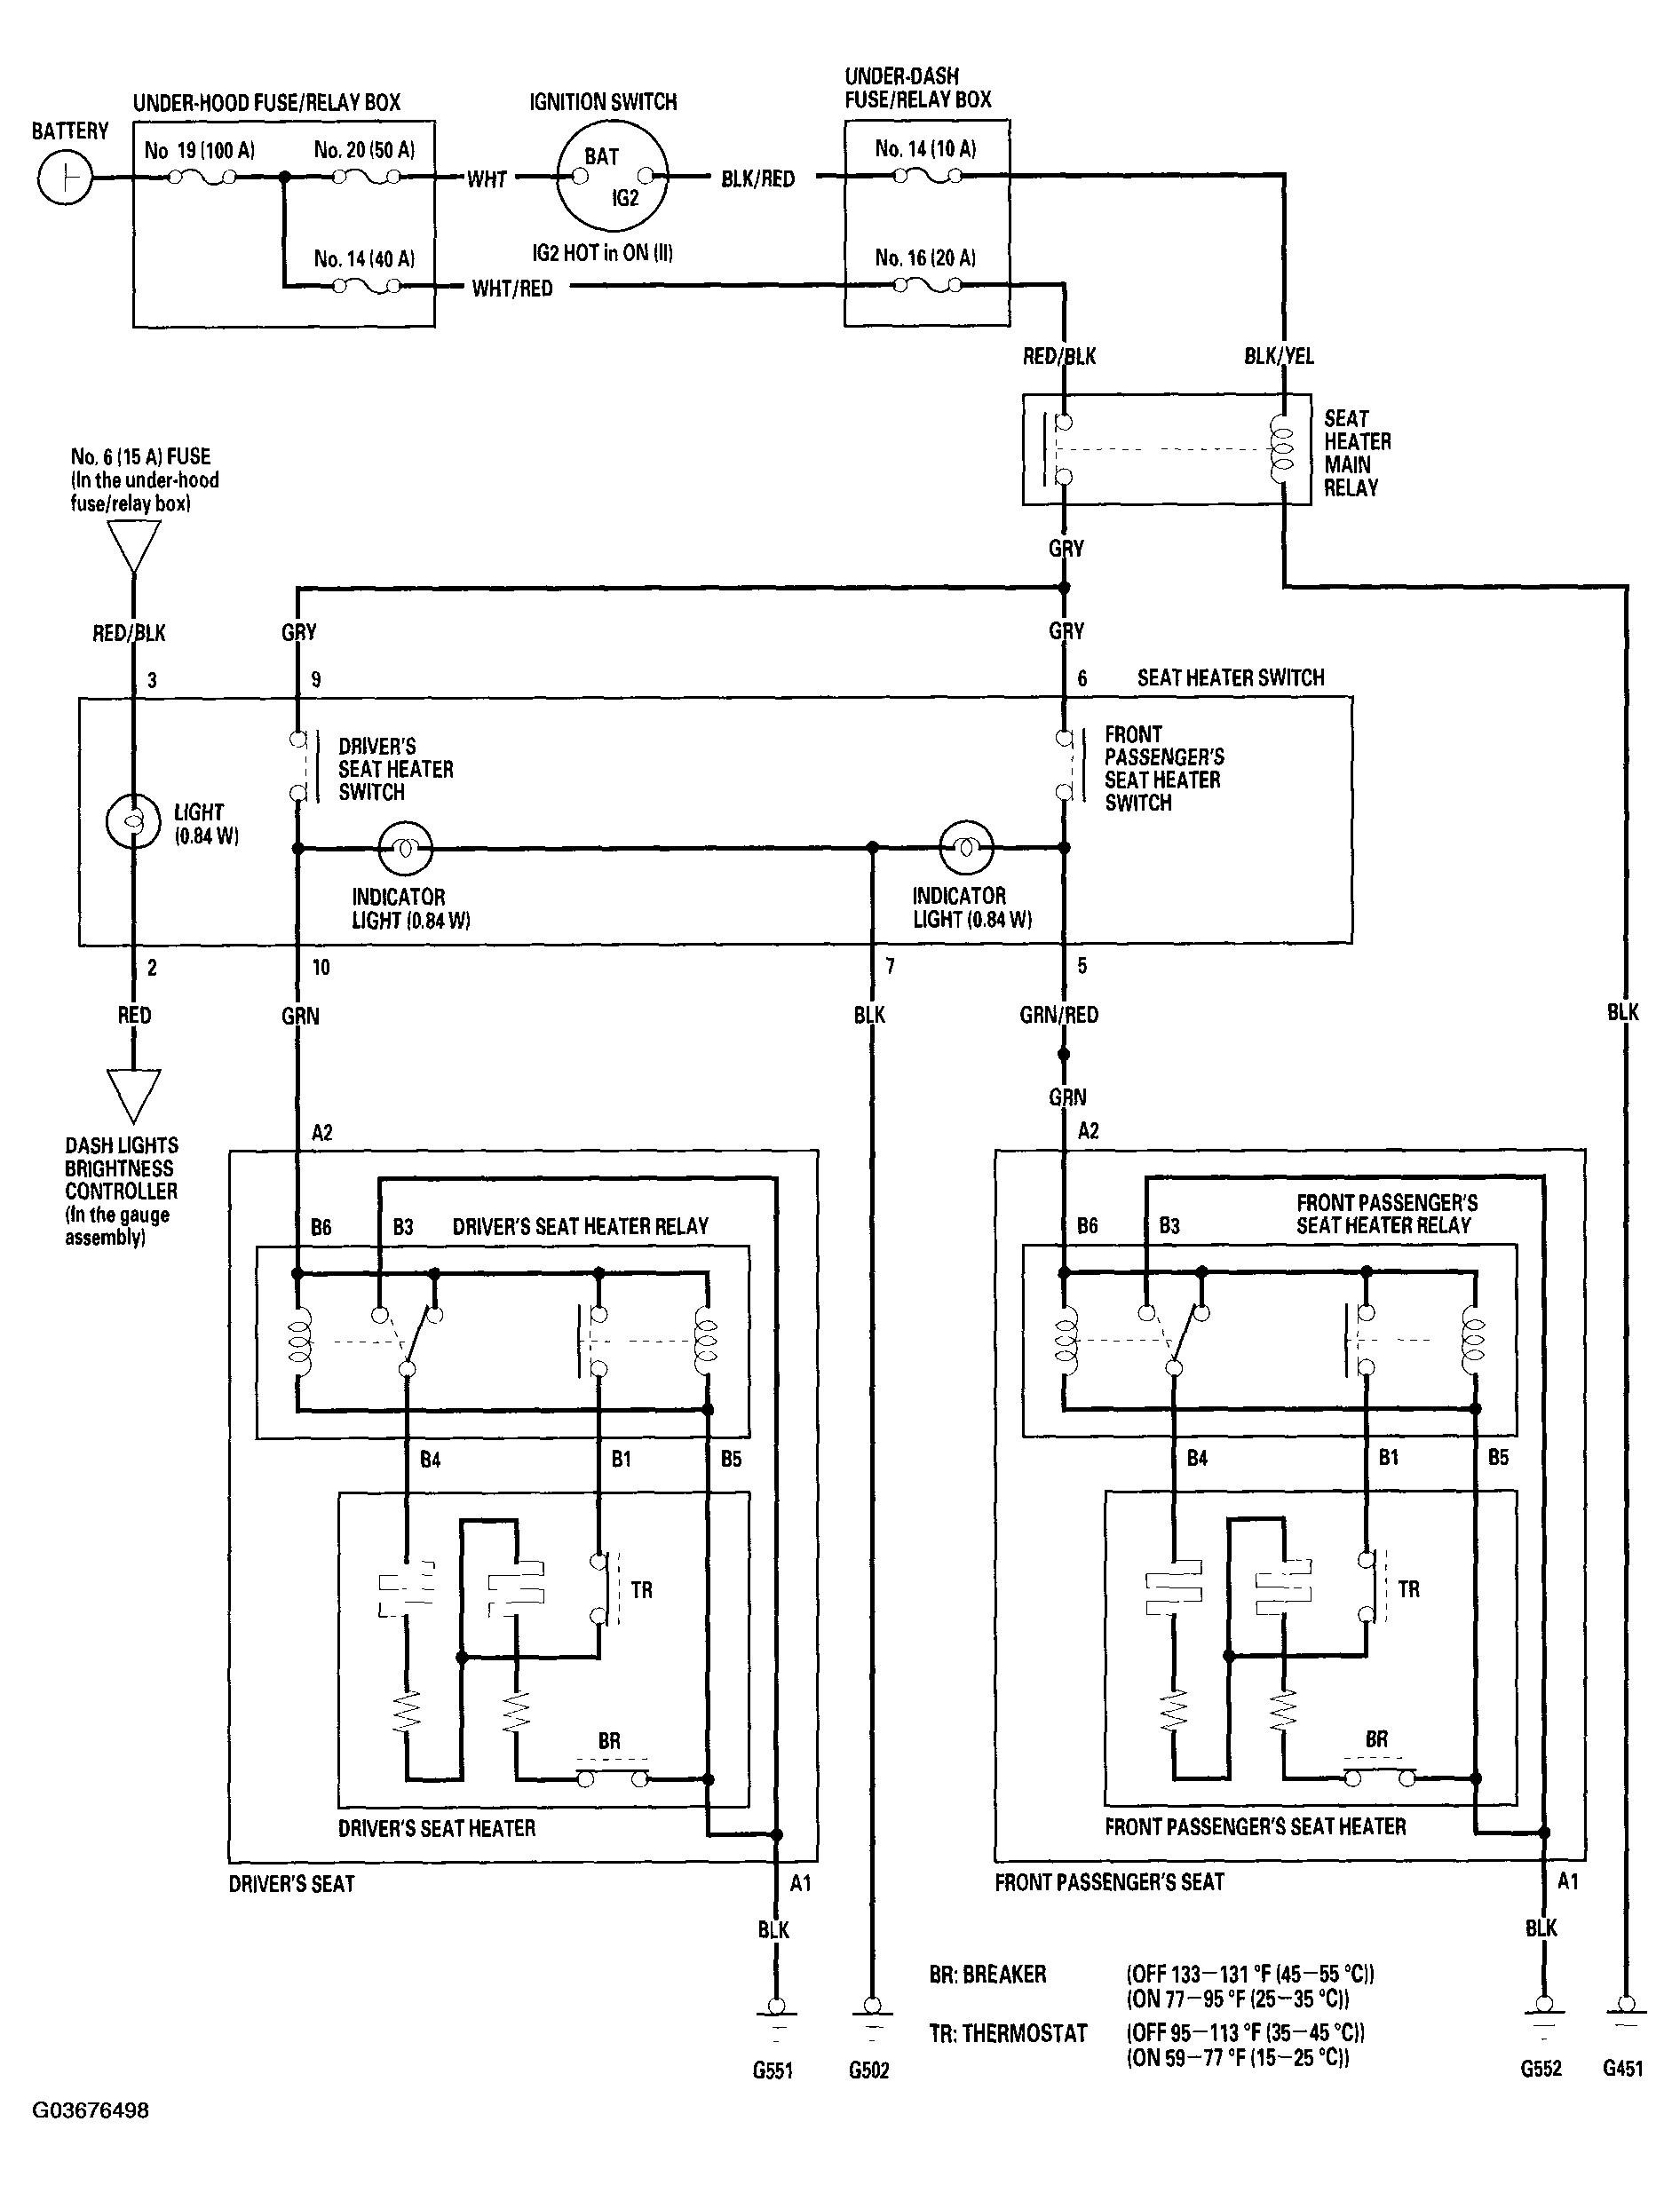 hight resolution of 2007 honda crv fuse box diagram basic electronics wiring diagram 2011 hyundai sonata wiring diagram 2007